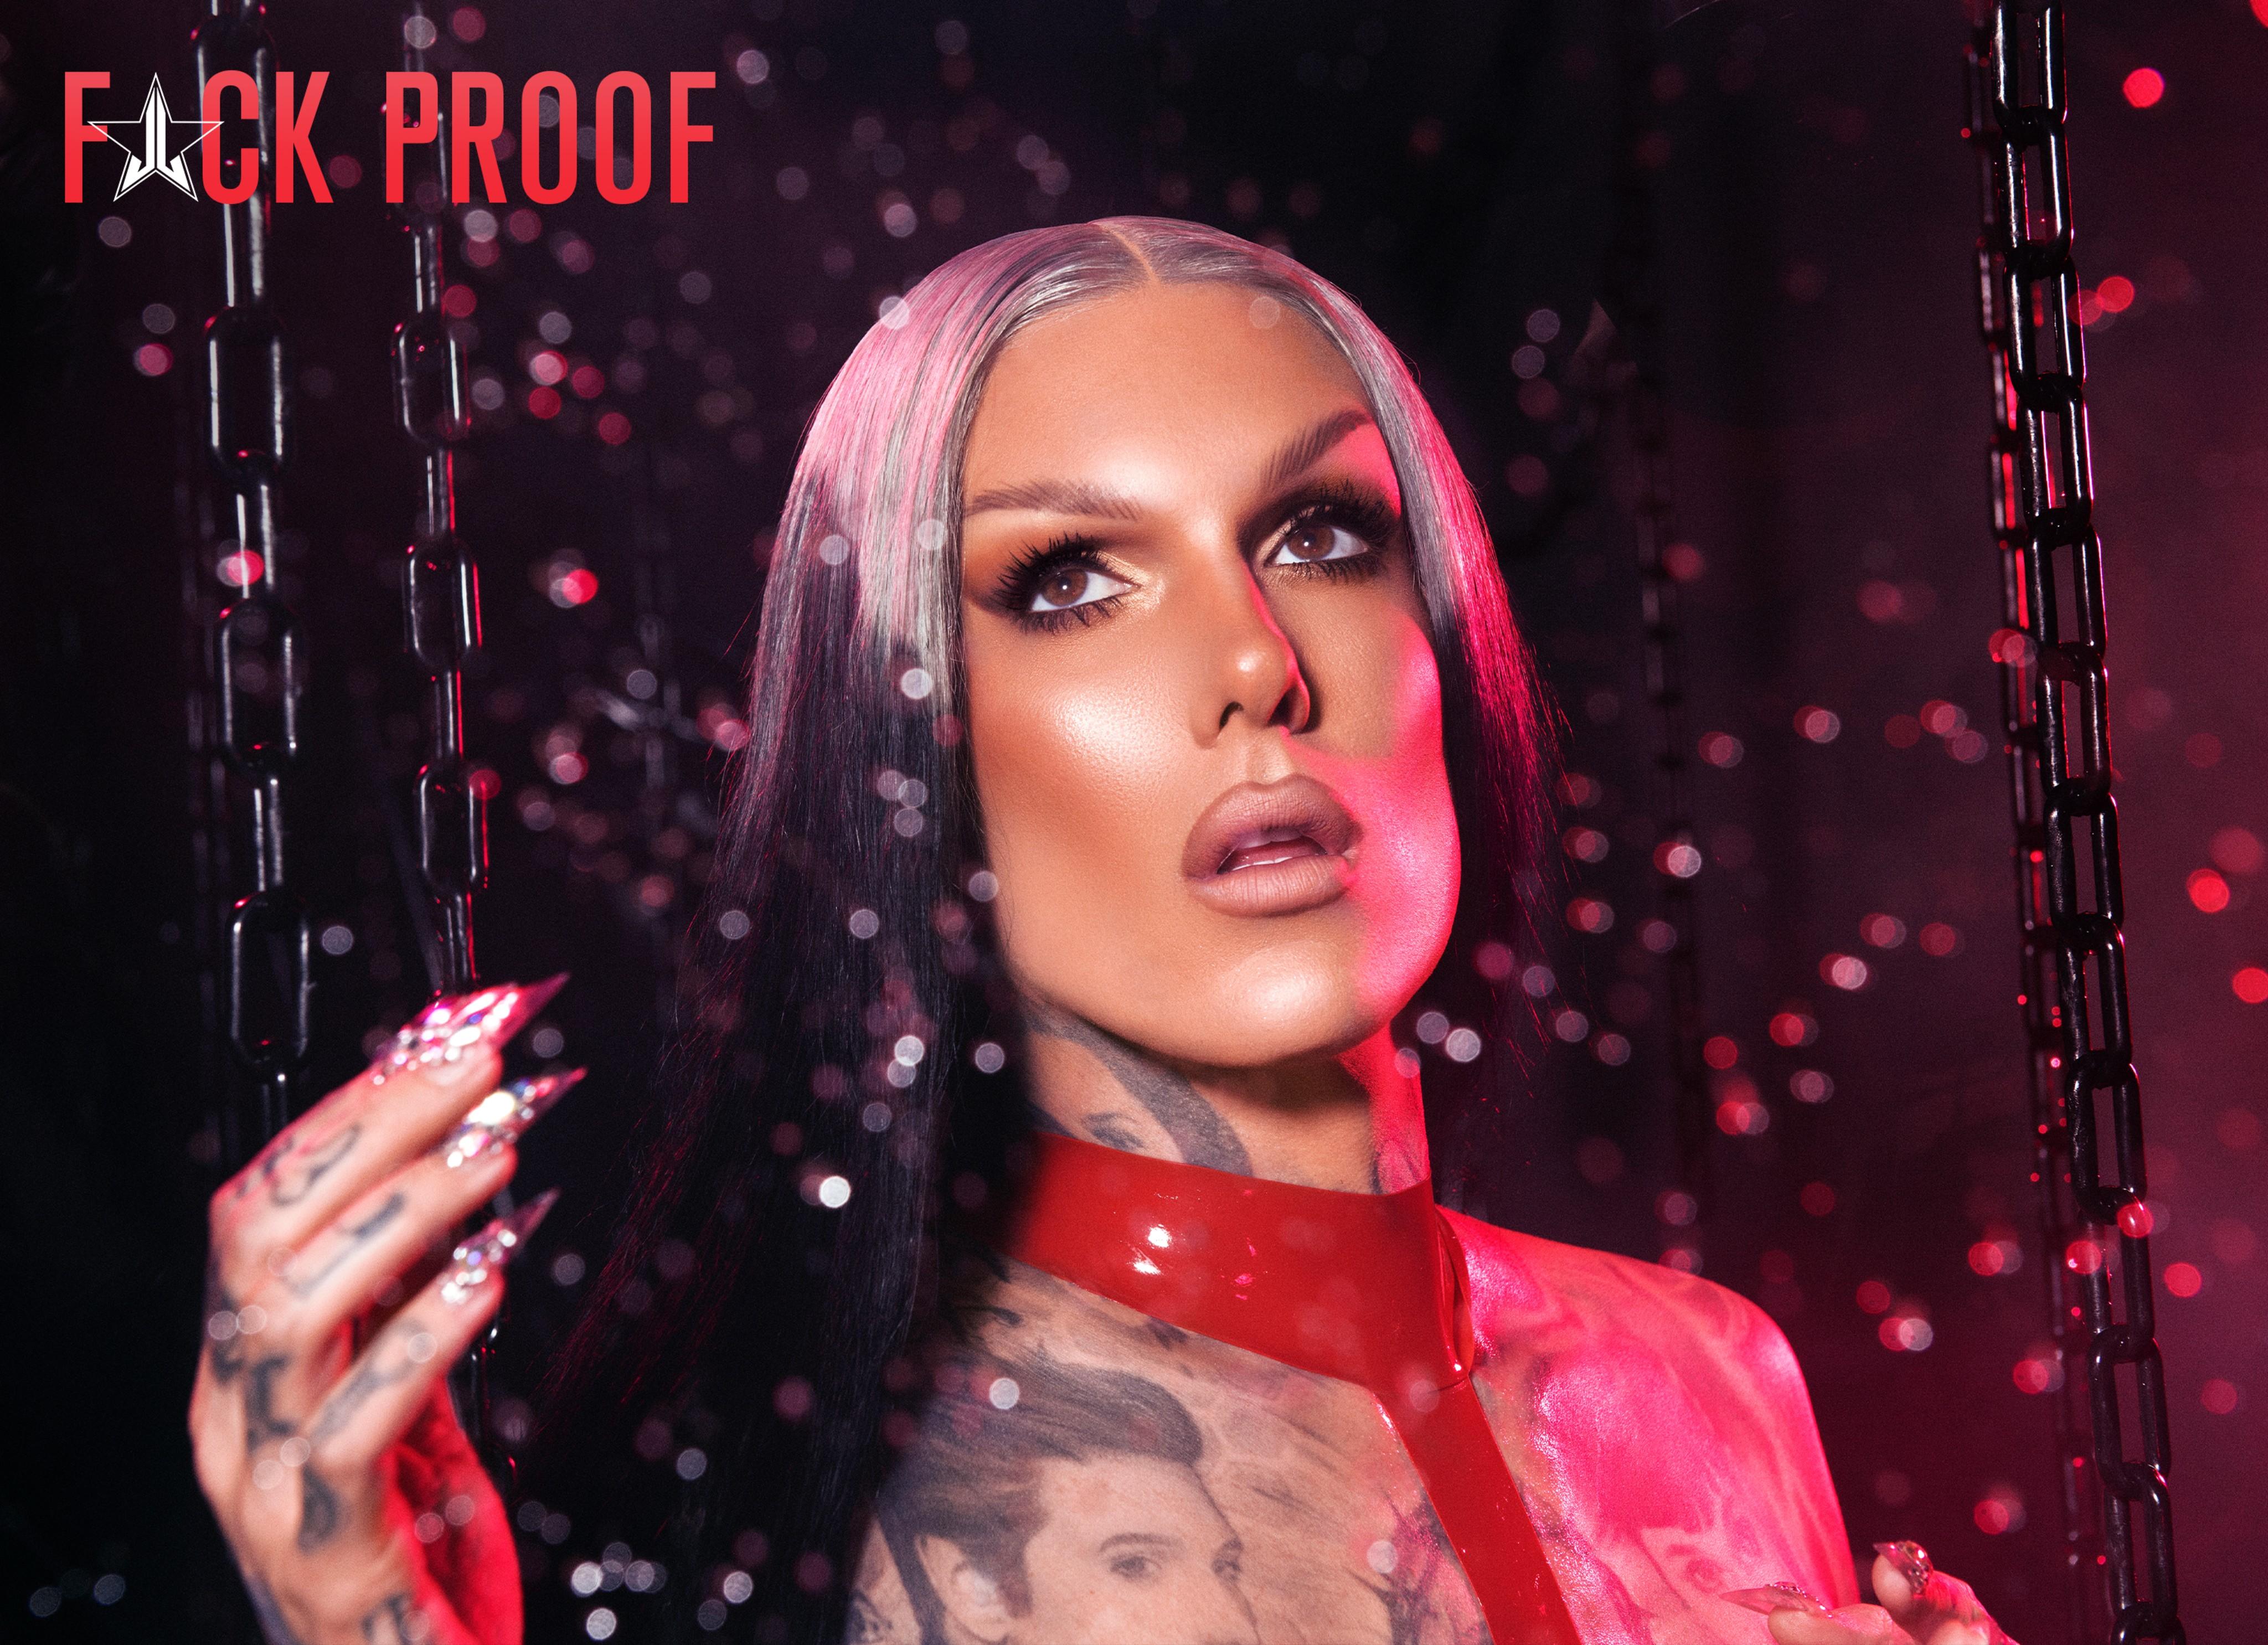 Makeup-beautyvisual-jeffreestar-2021-fck-proof-mascara-1-0323-Web-Rendition